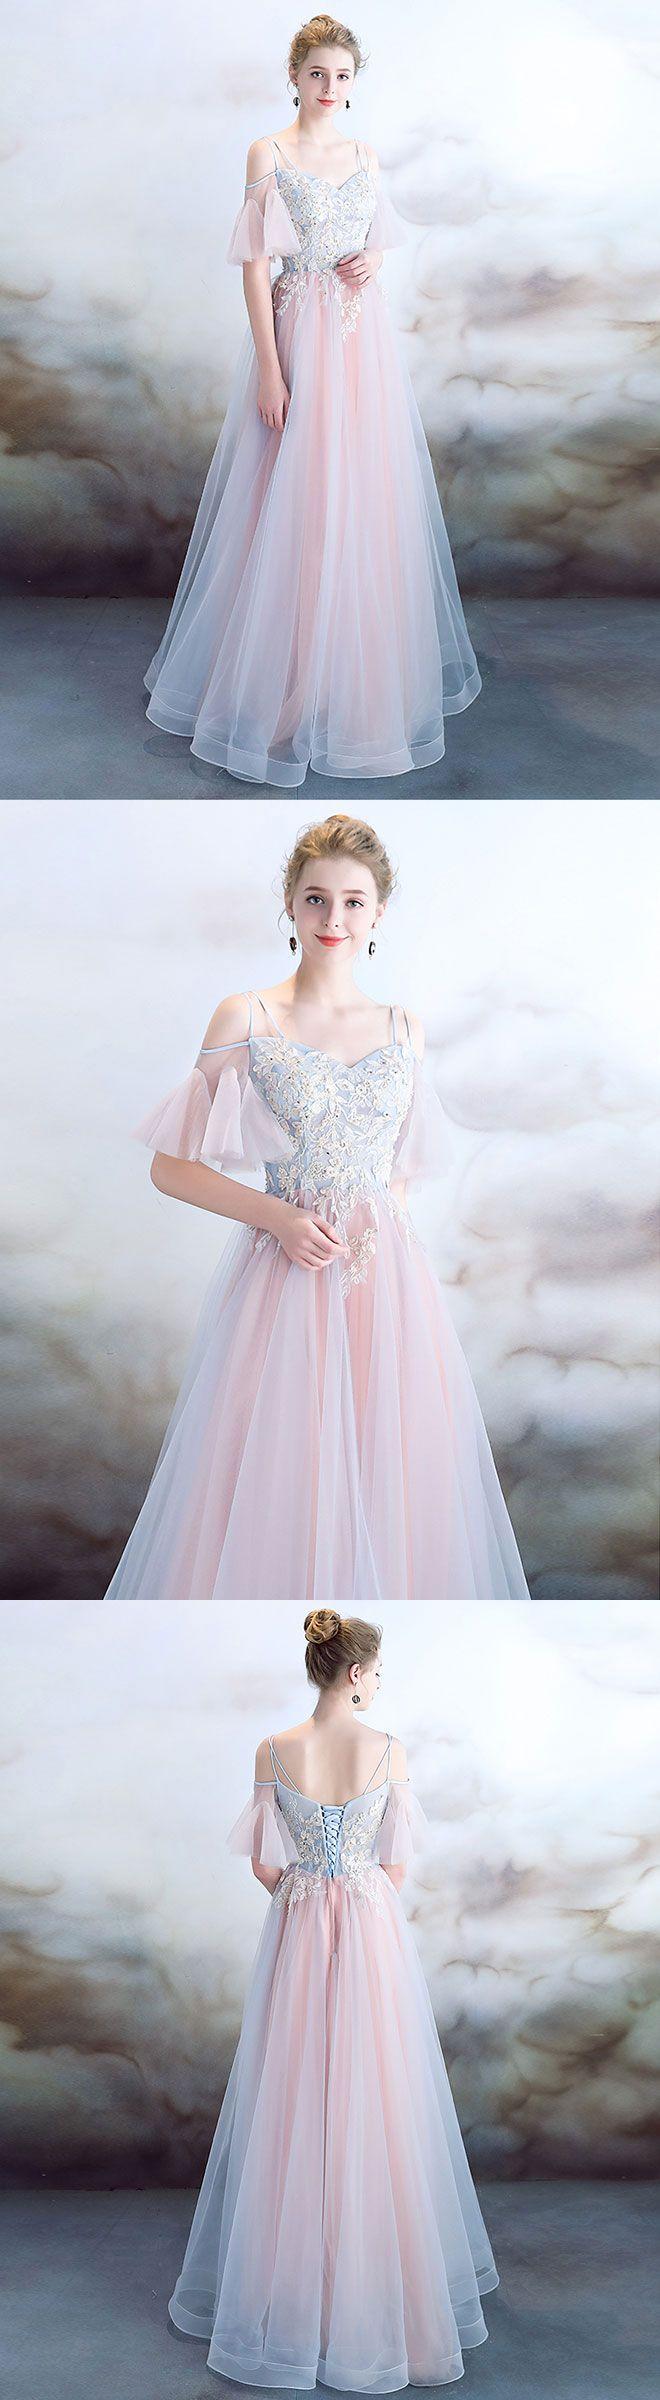 Elegant light pink tulle long prom dress pink evening dress